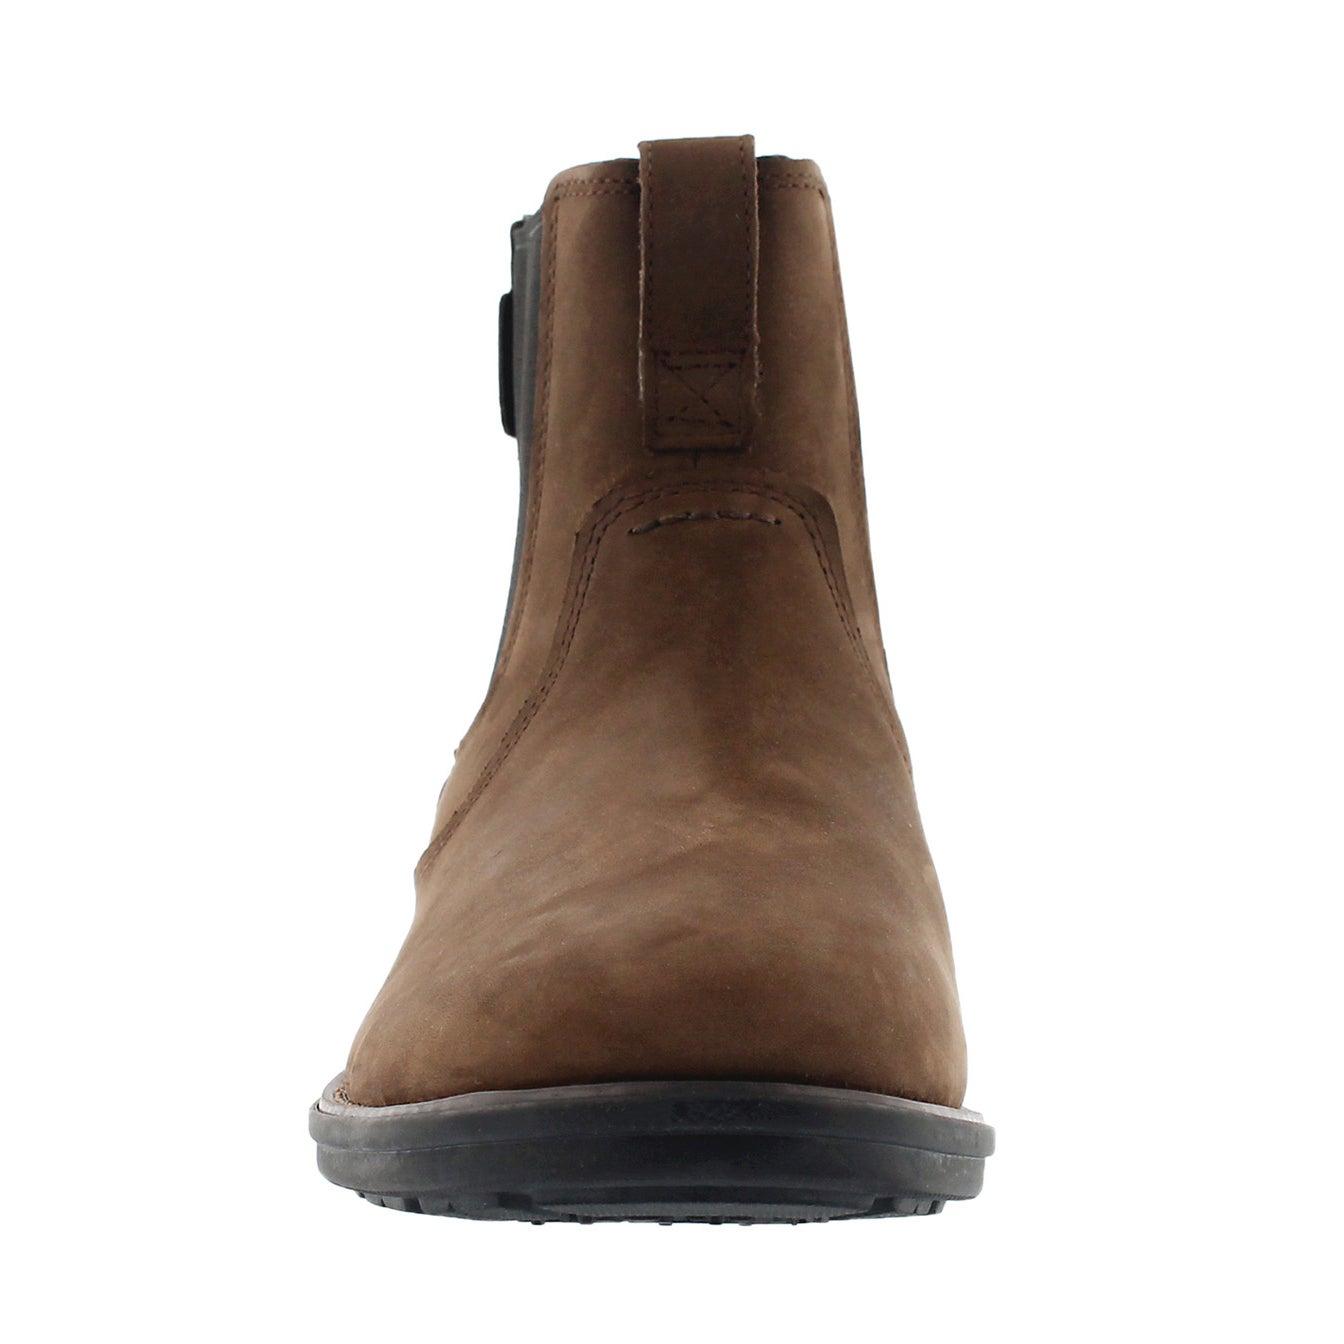 Mns Carter Notch brn chelsea boot- wide